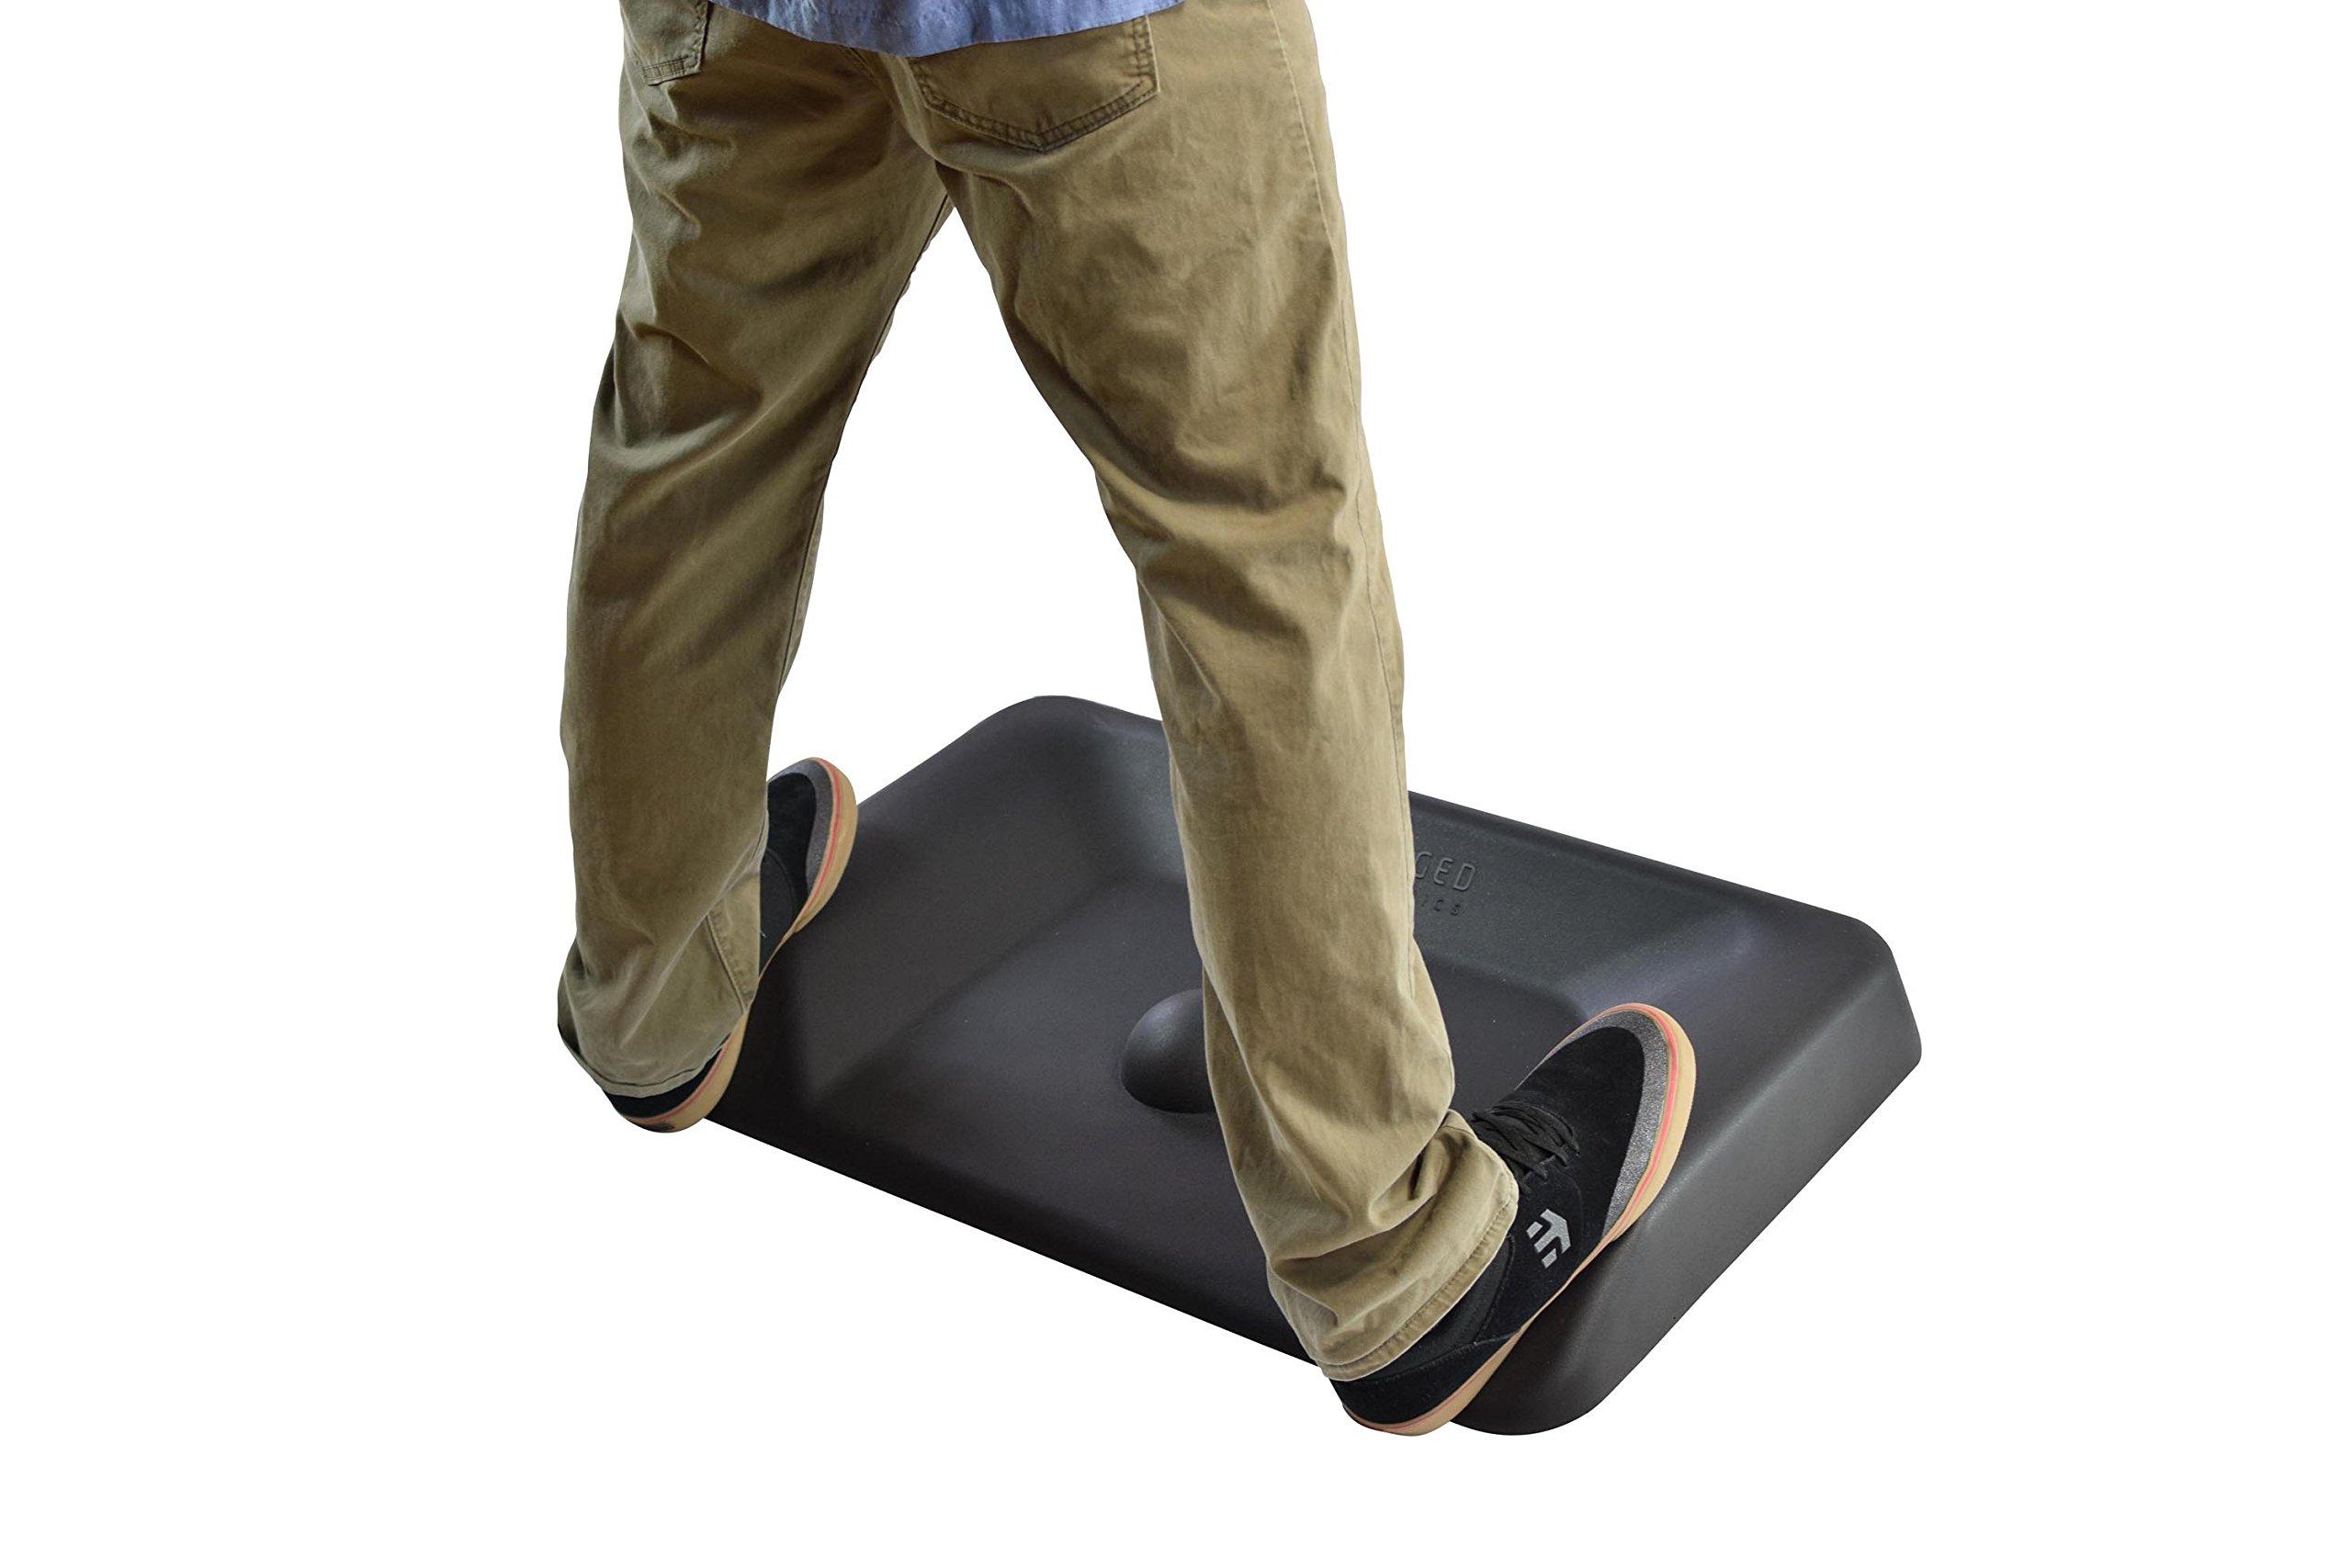 Uncaged Ergonomics (ASM-b) Active Standing Anti-Fatigue Mat. Thick Contoured Massaging Not Flat Comfort Cushion Floor Mat Designed to Encourage Movement. Best Standing Desk Mat by Uncaged Ergonomics